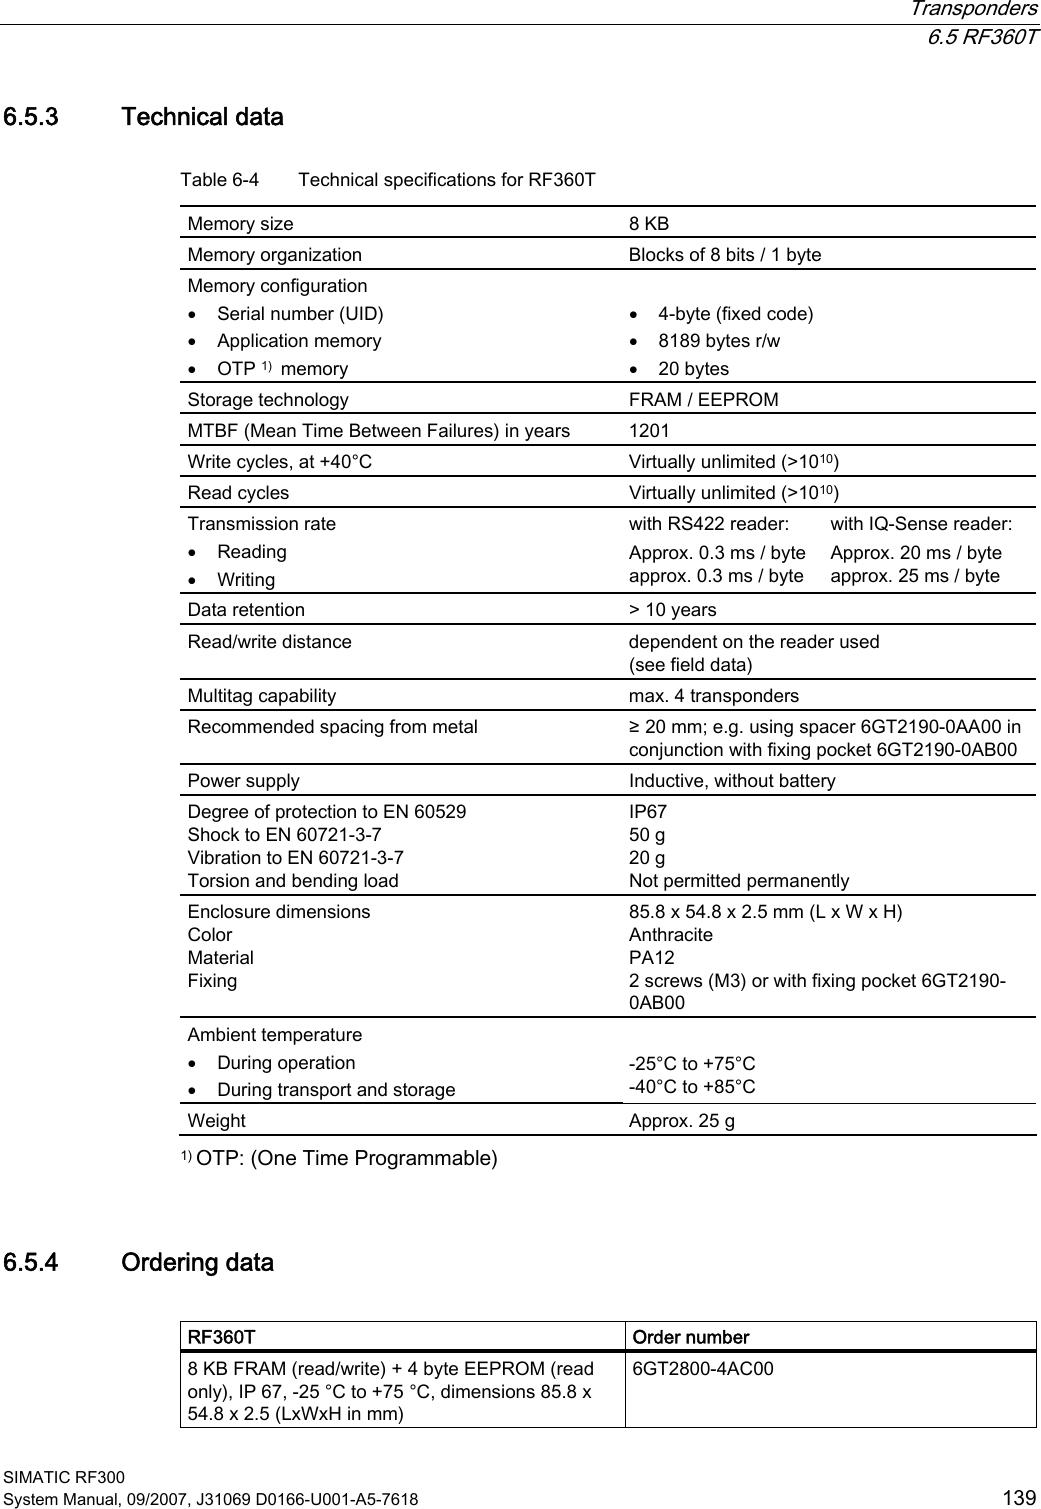 Siemens Rf380r Tag Reader User Manual Simatic Sensors Rfid